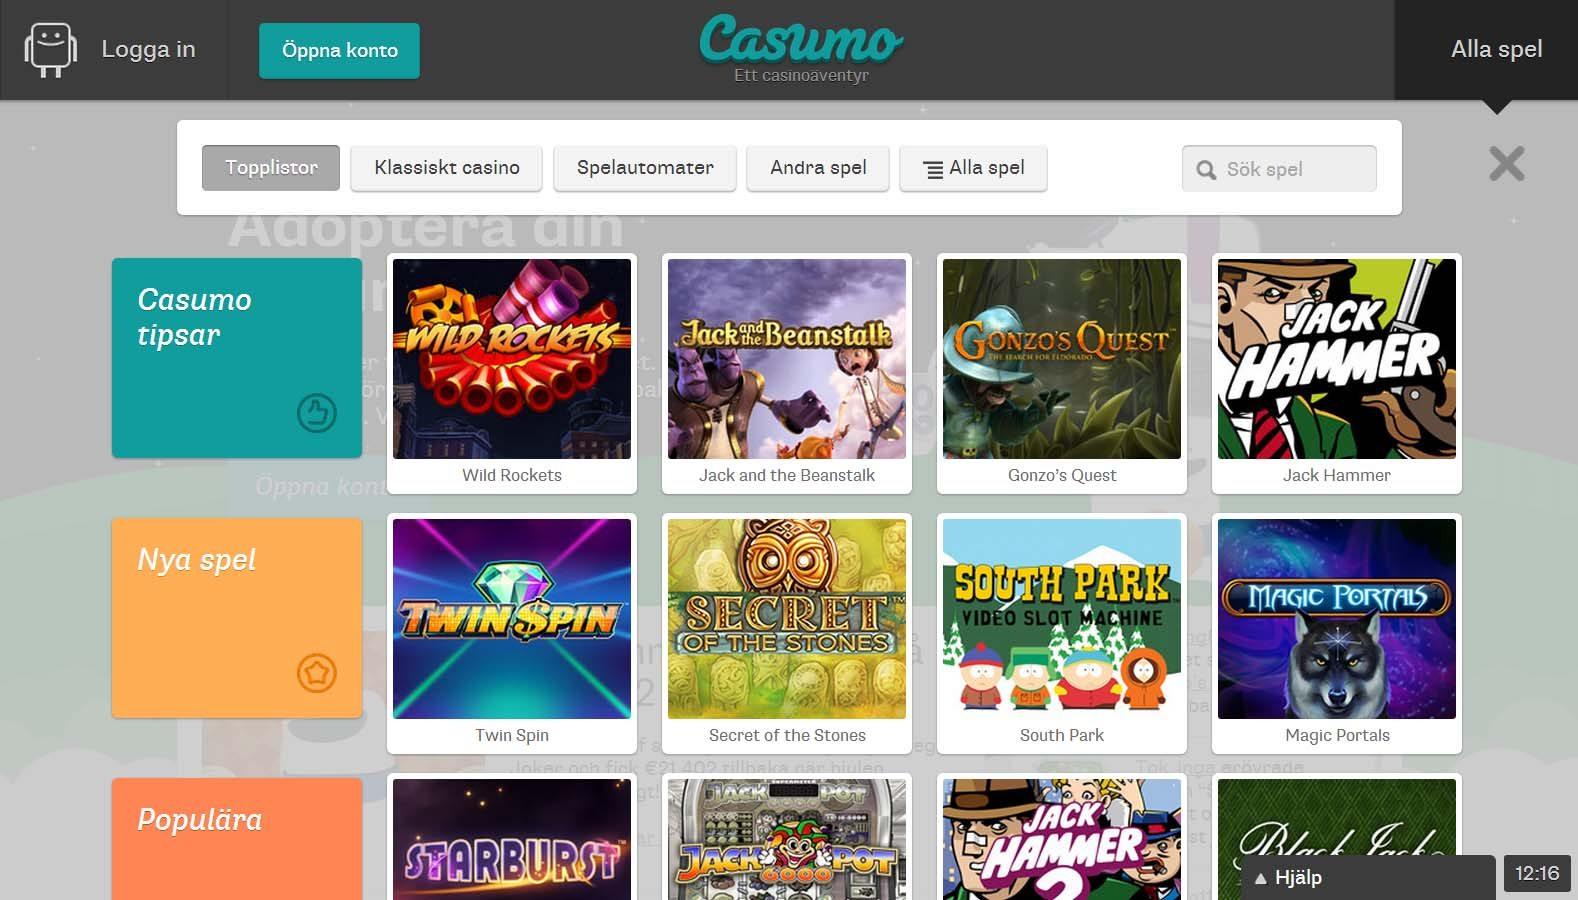 Casino bitcoin deposit kan upplevelse